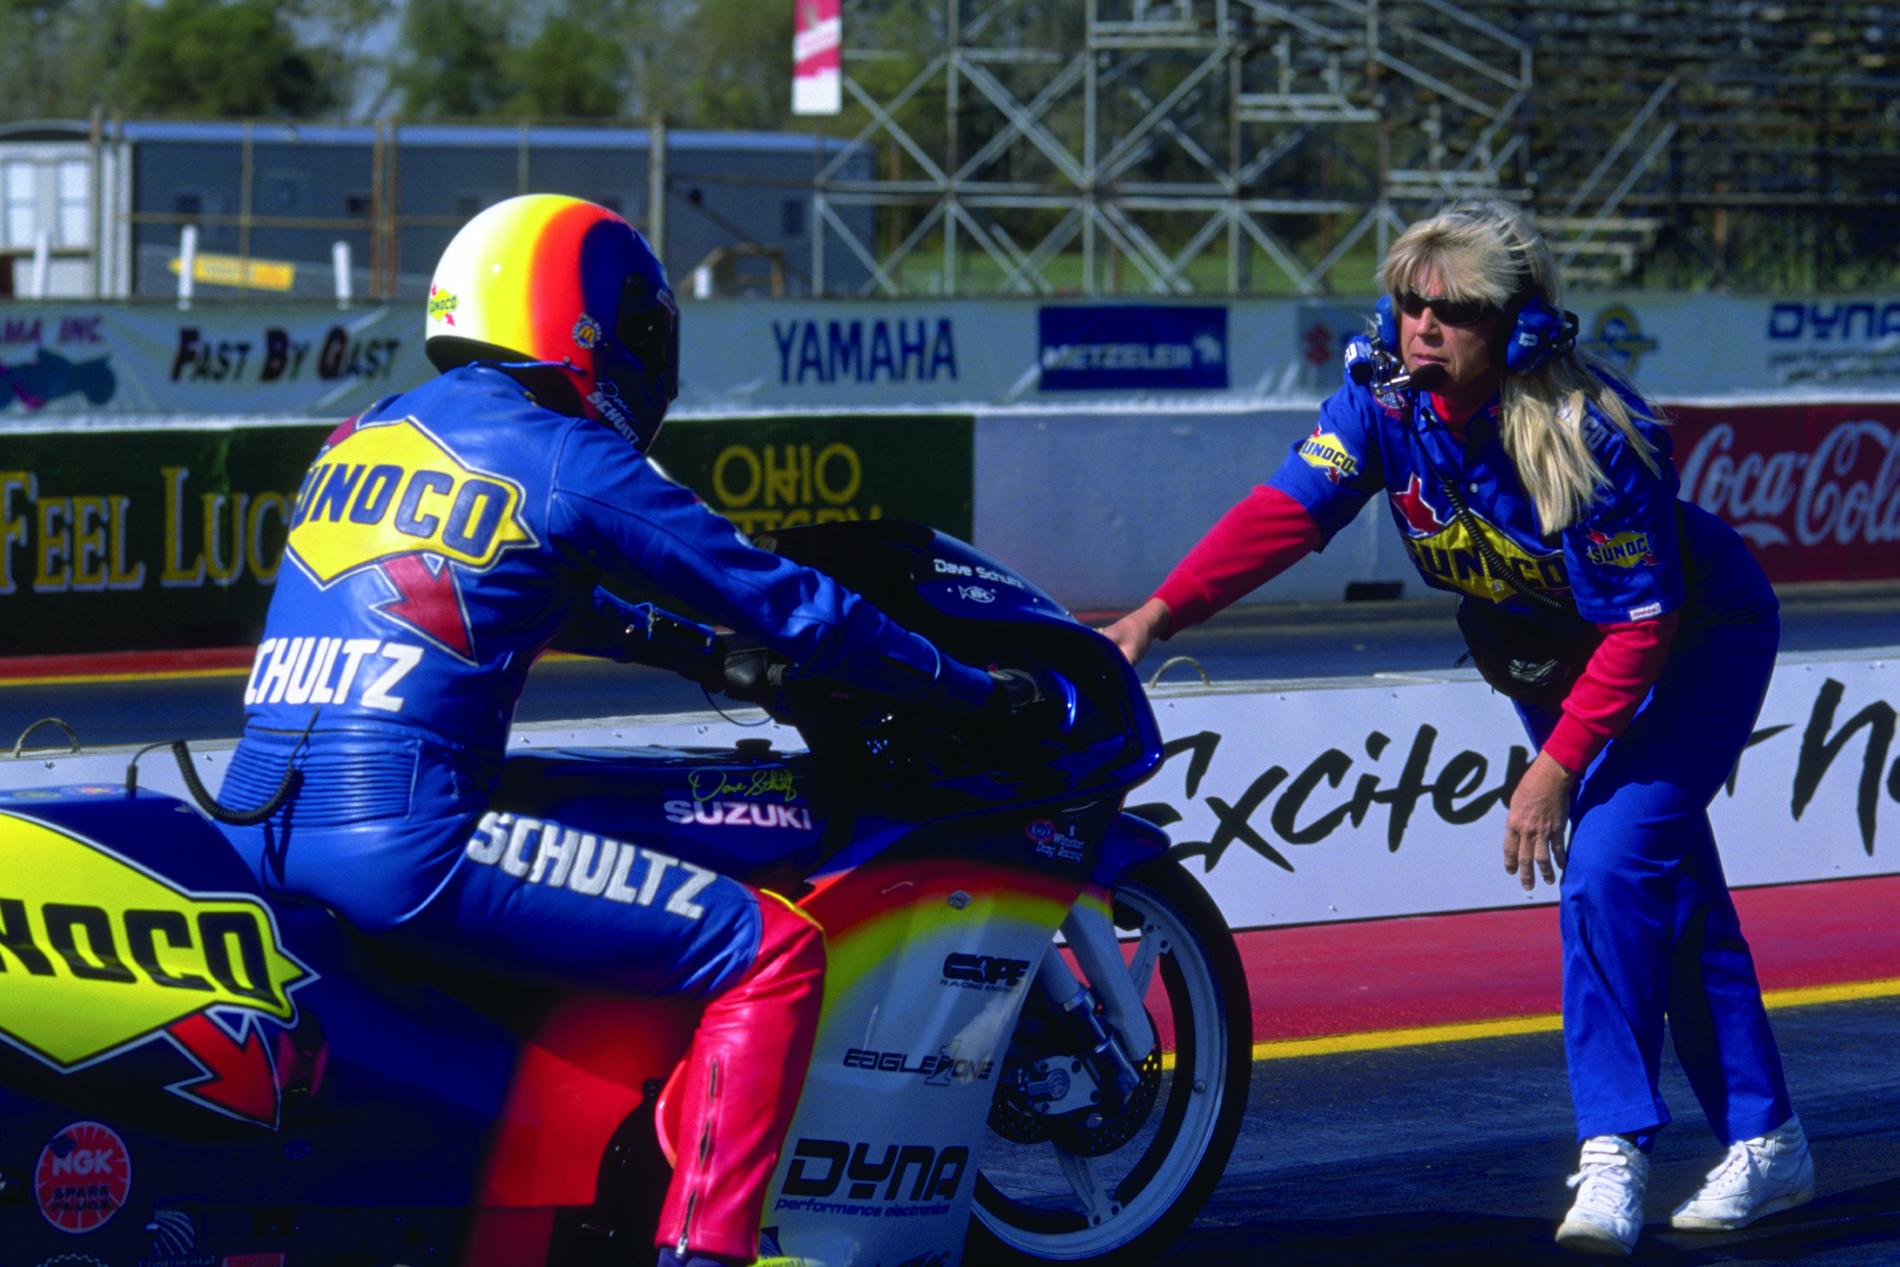 Kosman racing products - Dave Schultz Meredith Schultz